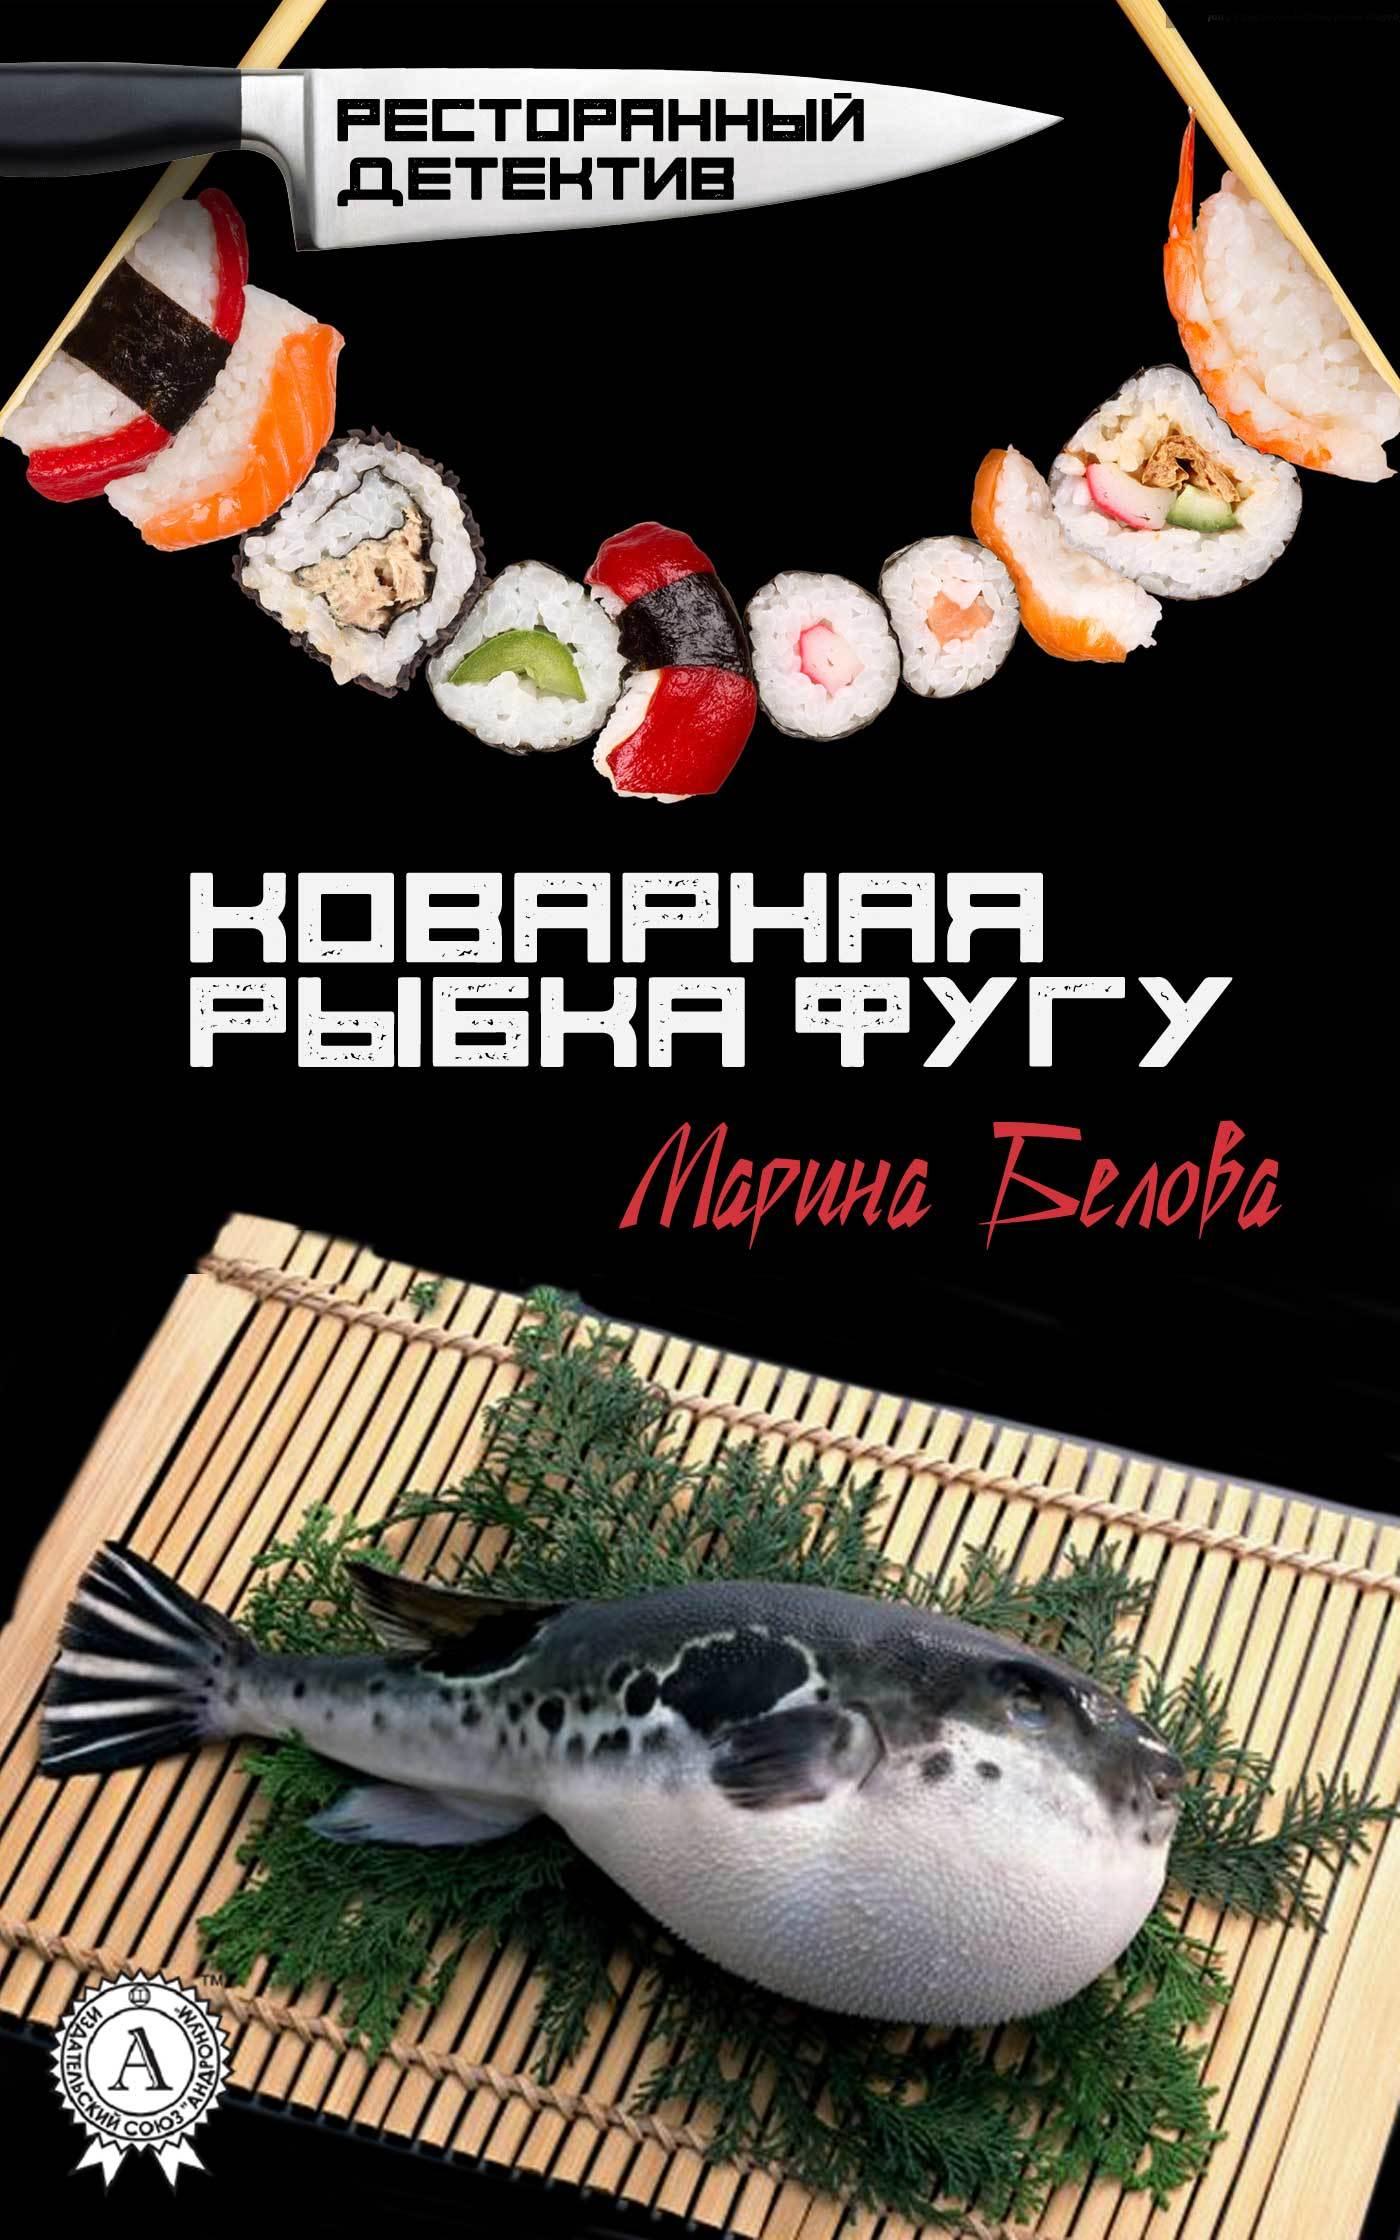 Марина Белова - Коварная рыбка фугу